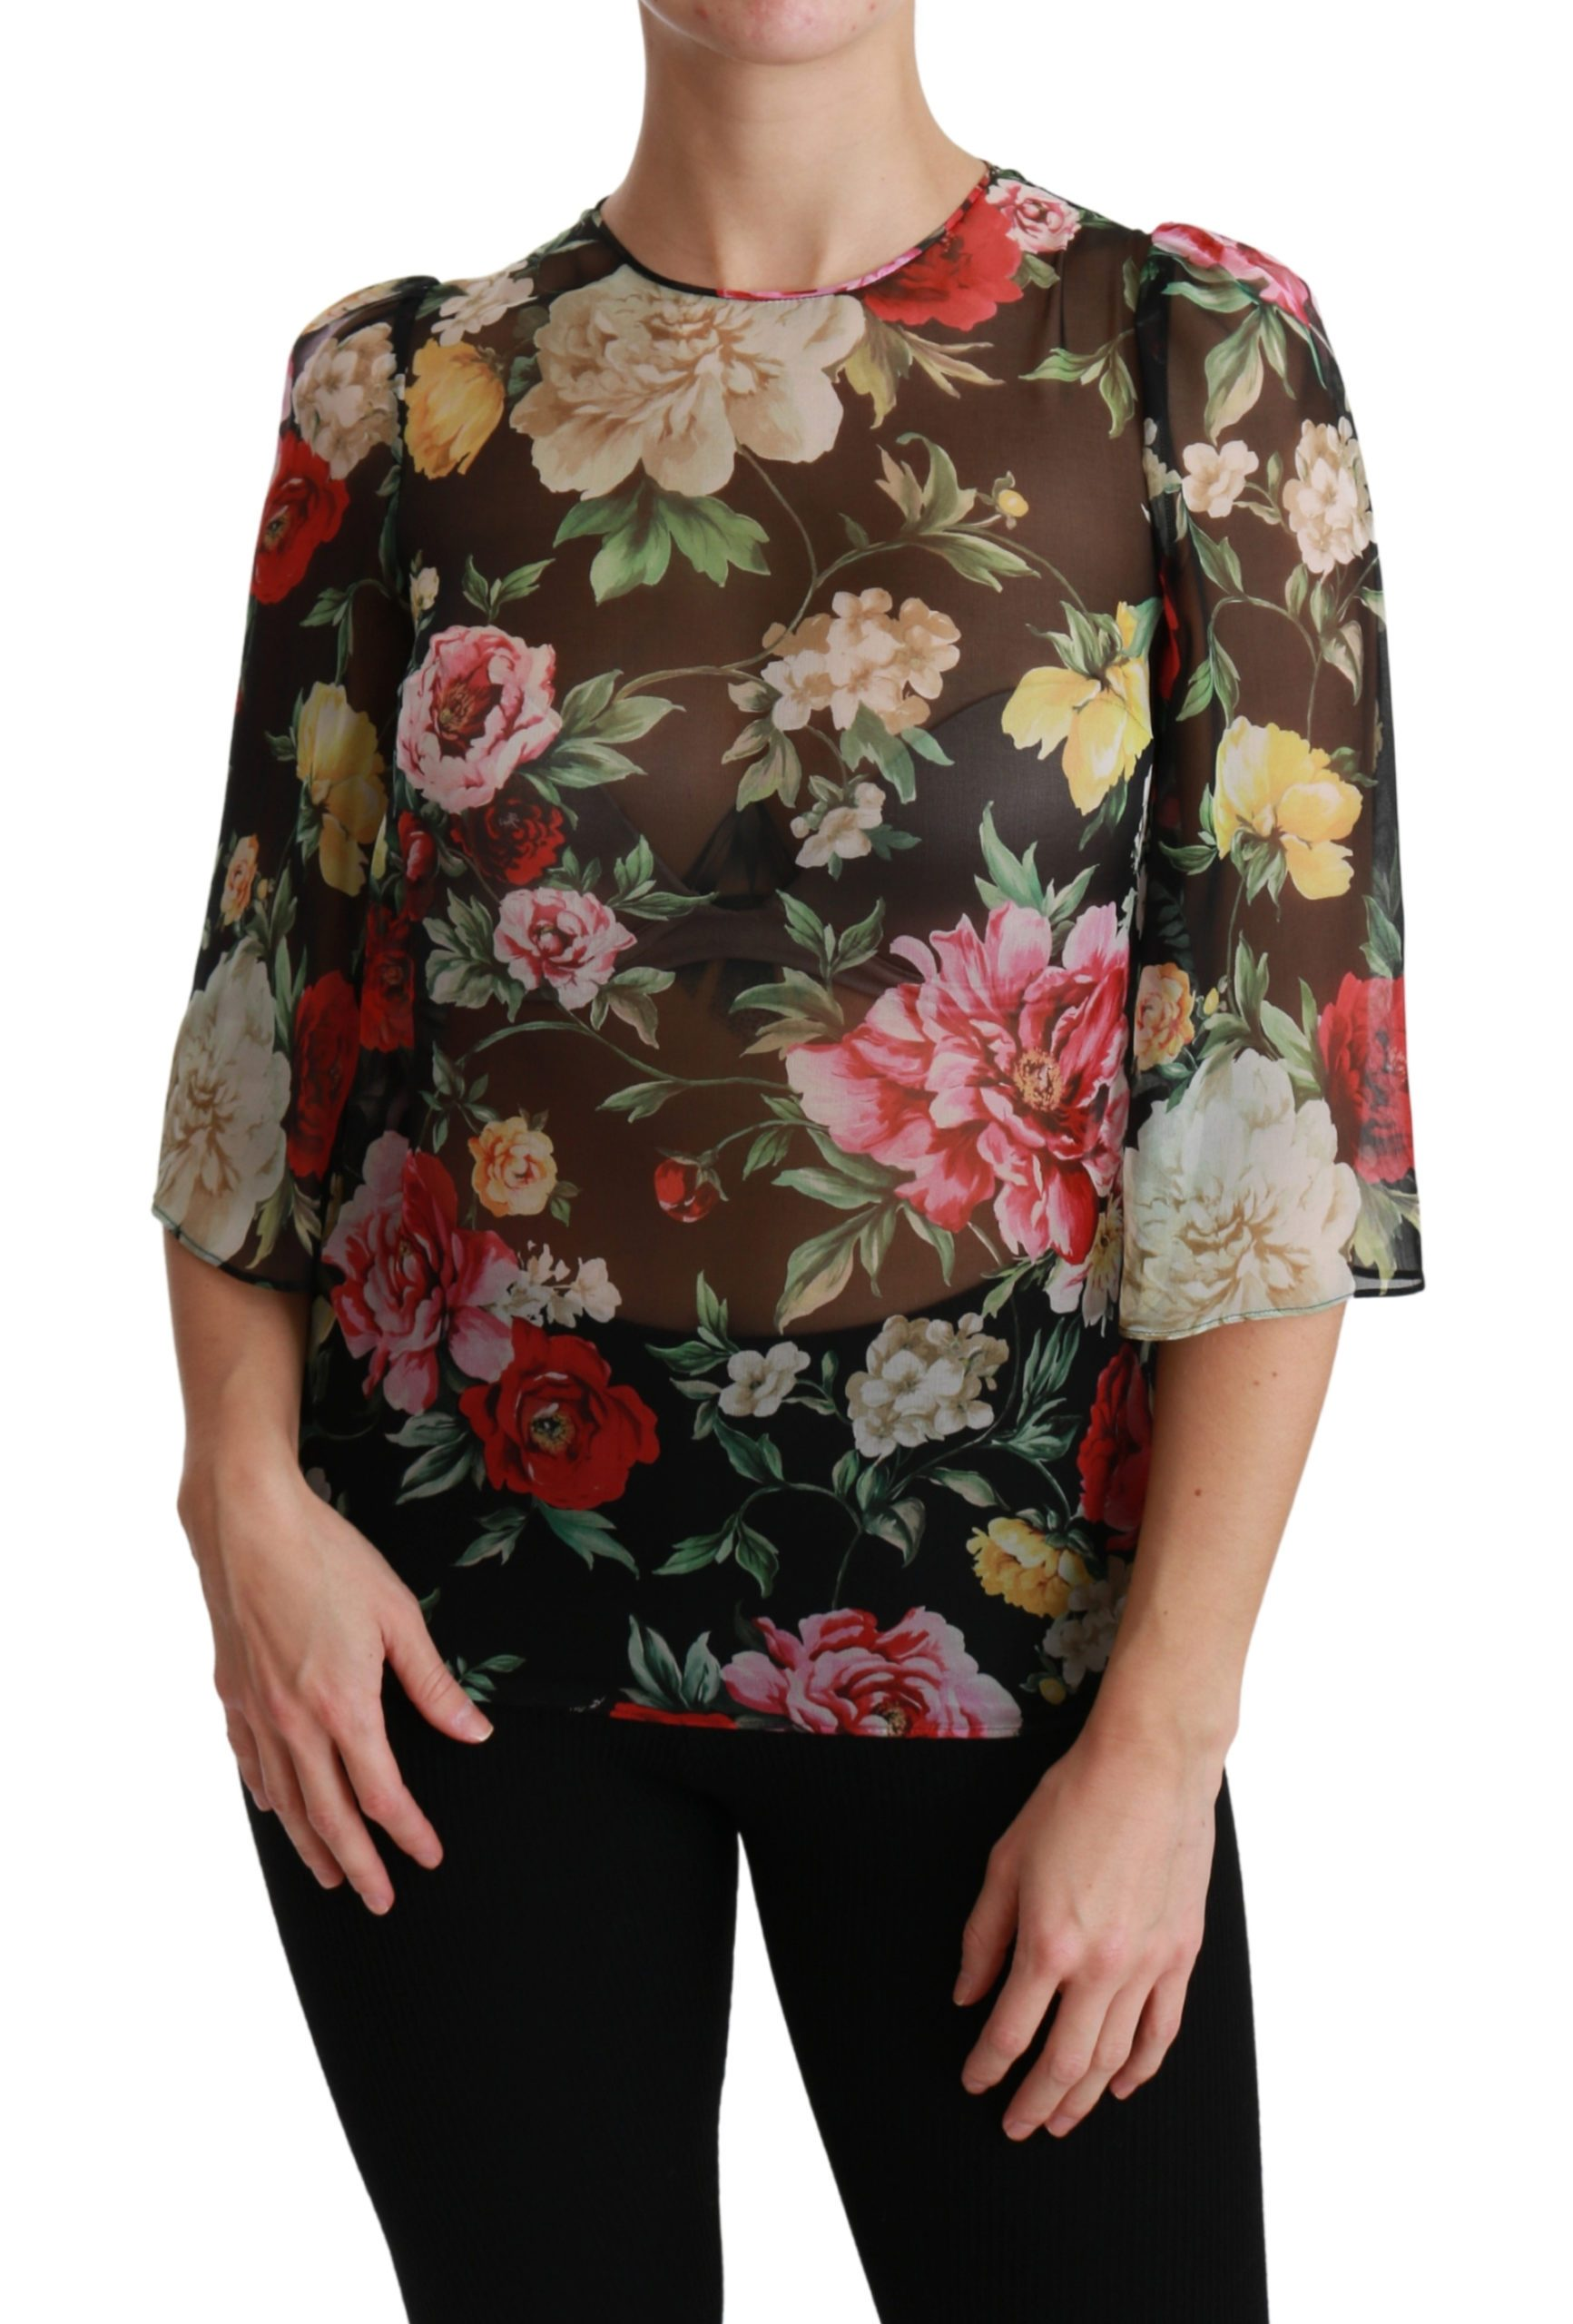 Dolce & Gabbana Women's Floral Sleeve Silk Top Black TSH4474 - IT36 | XS